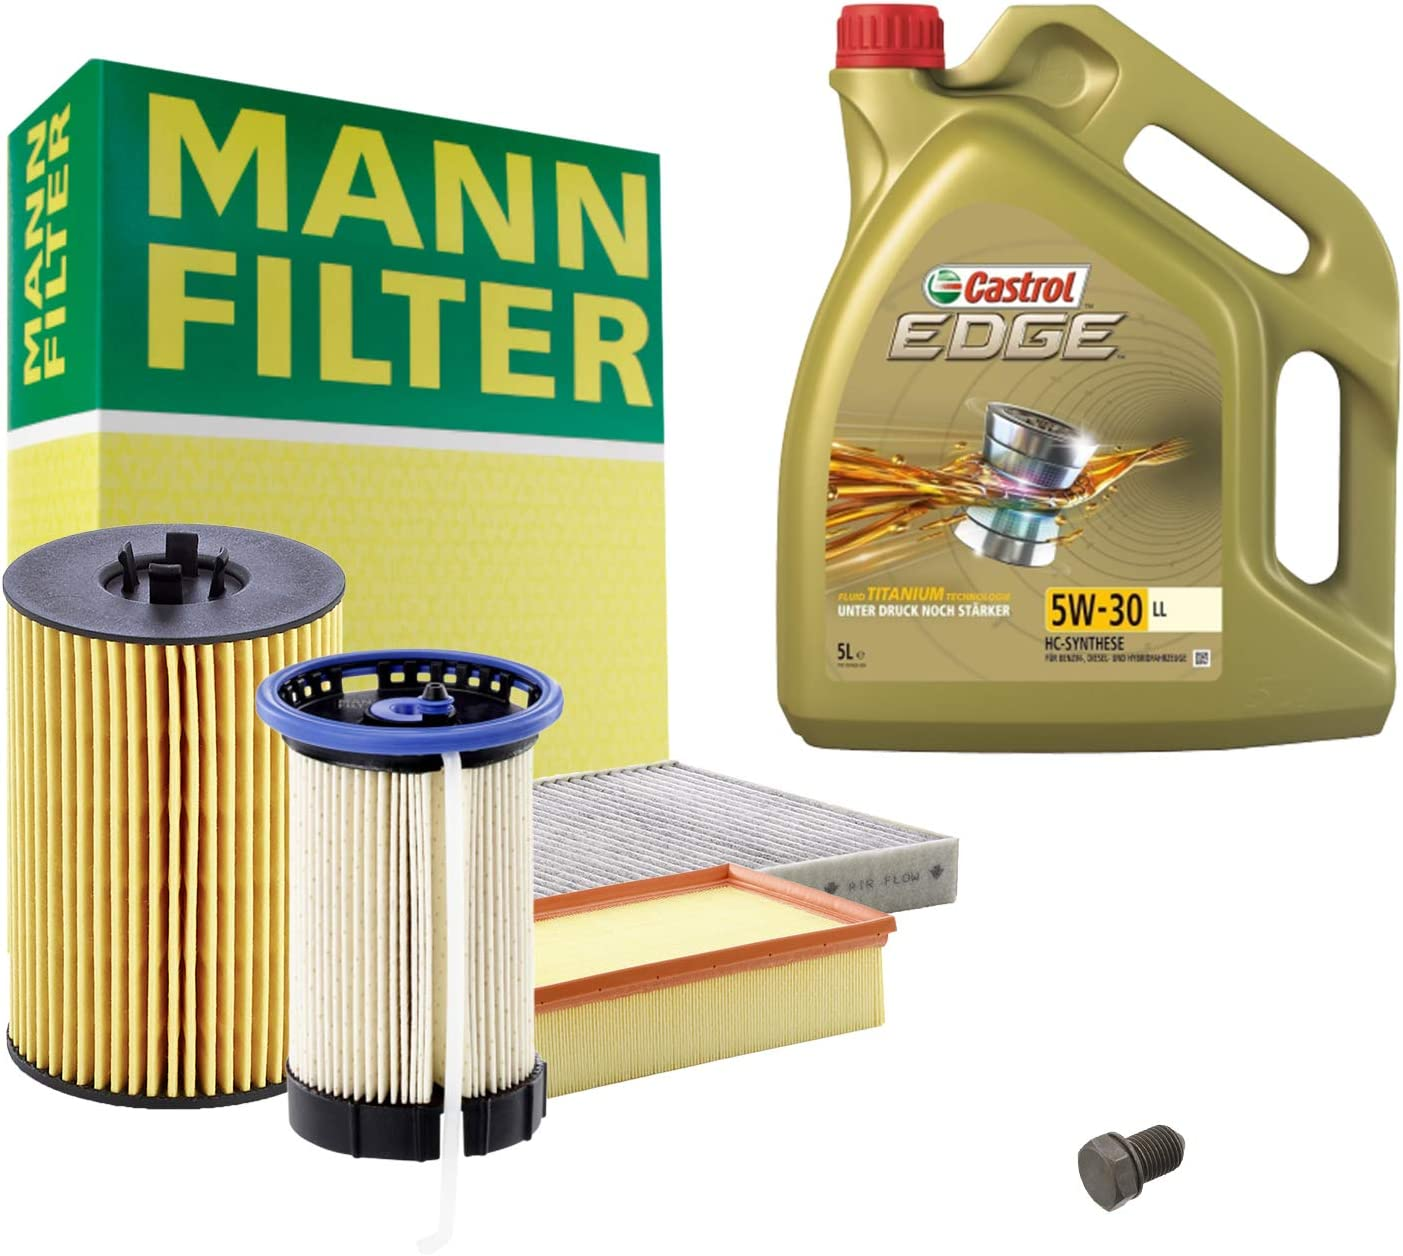 Inspektionspaket Mann Filter 5l Castrol Edge 5w30 Filterset Service Set Set P H 05 00102 Service Wartung Auto